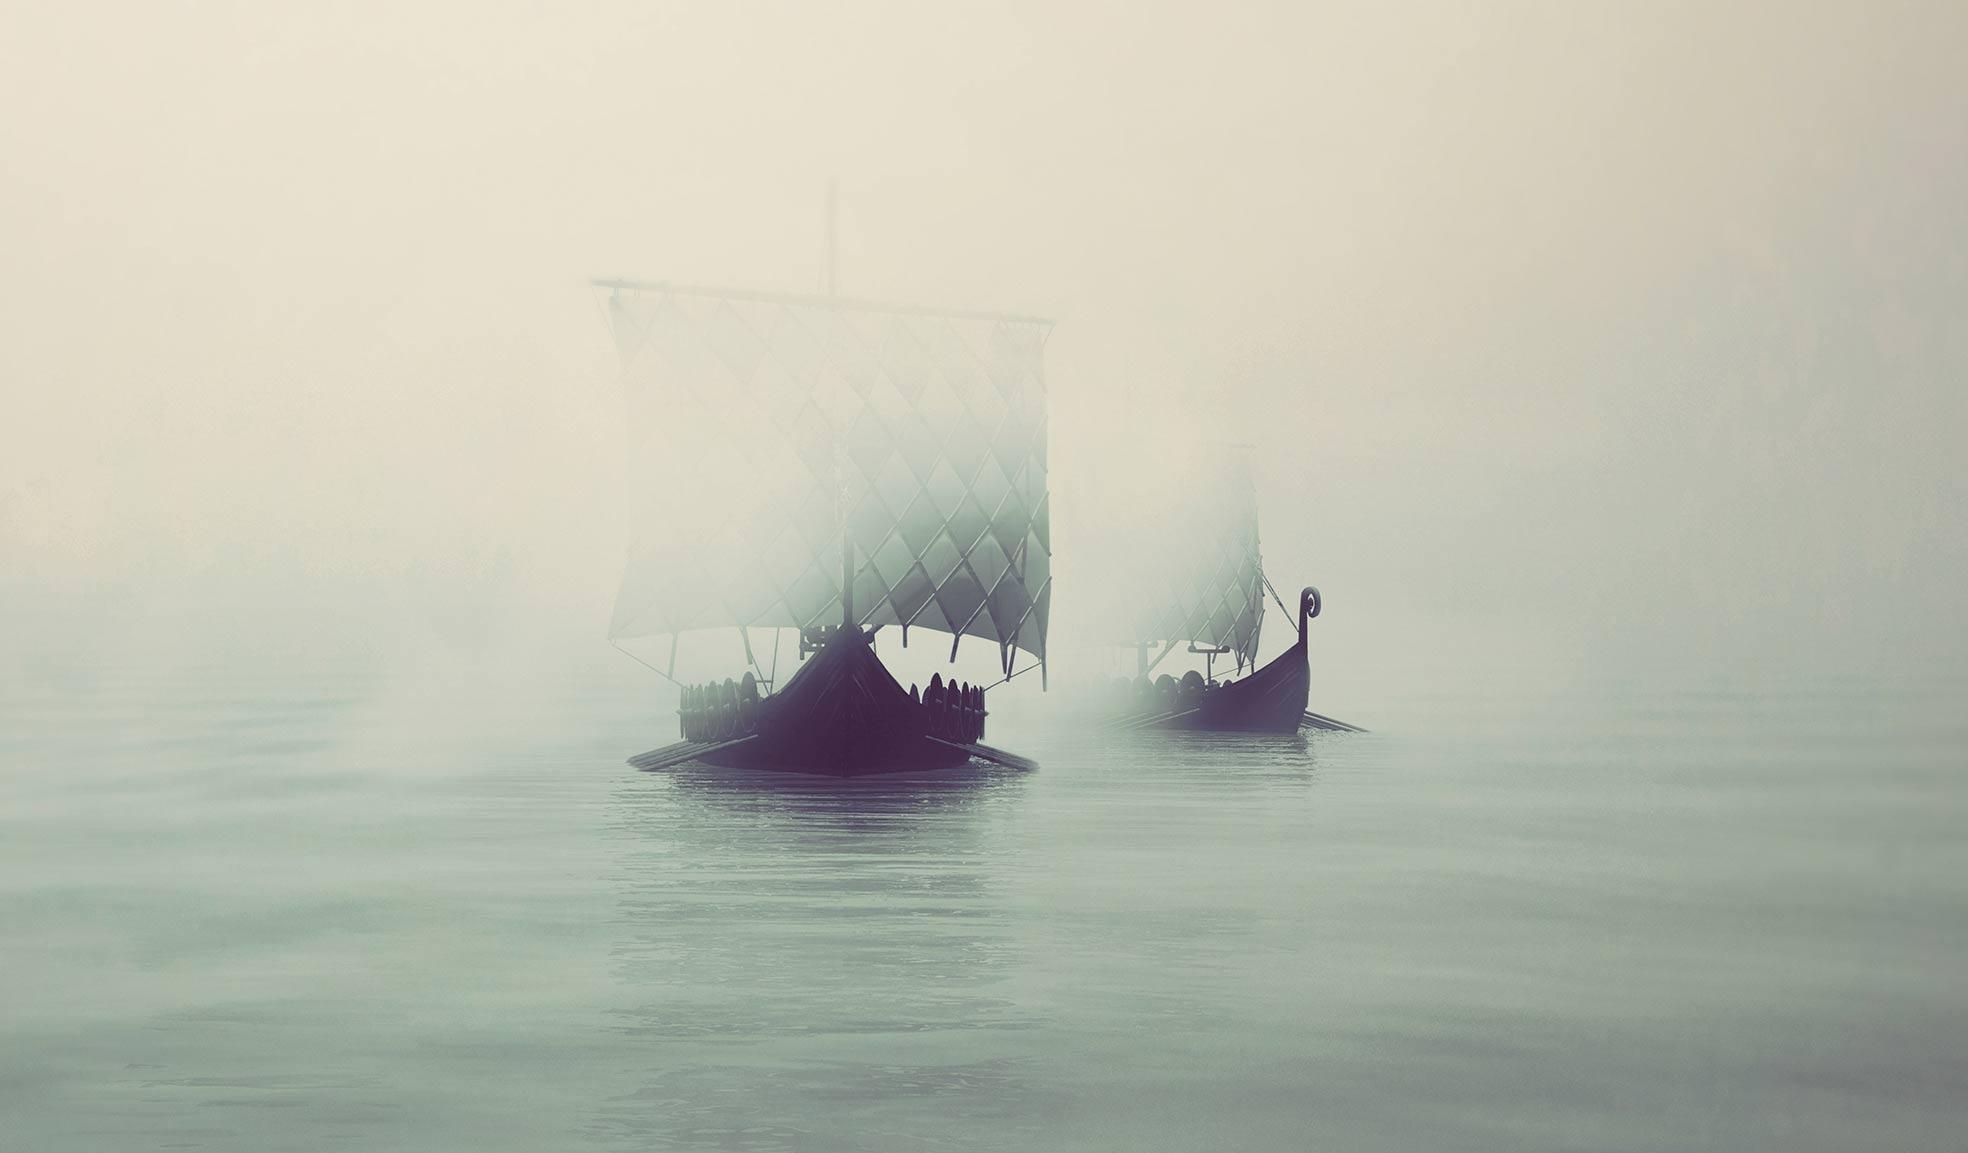 exposition-viking-chateau-nantes